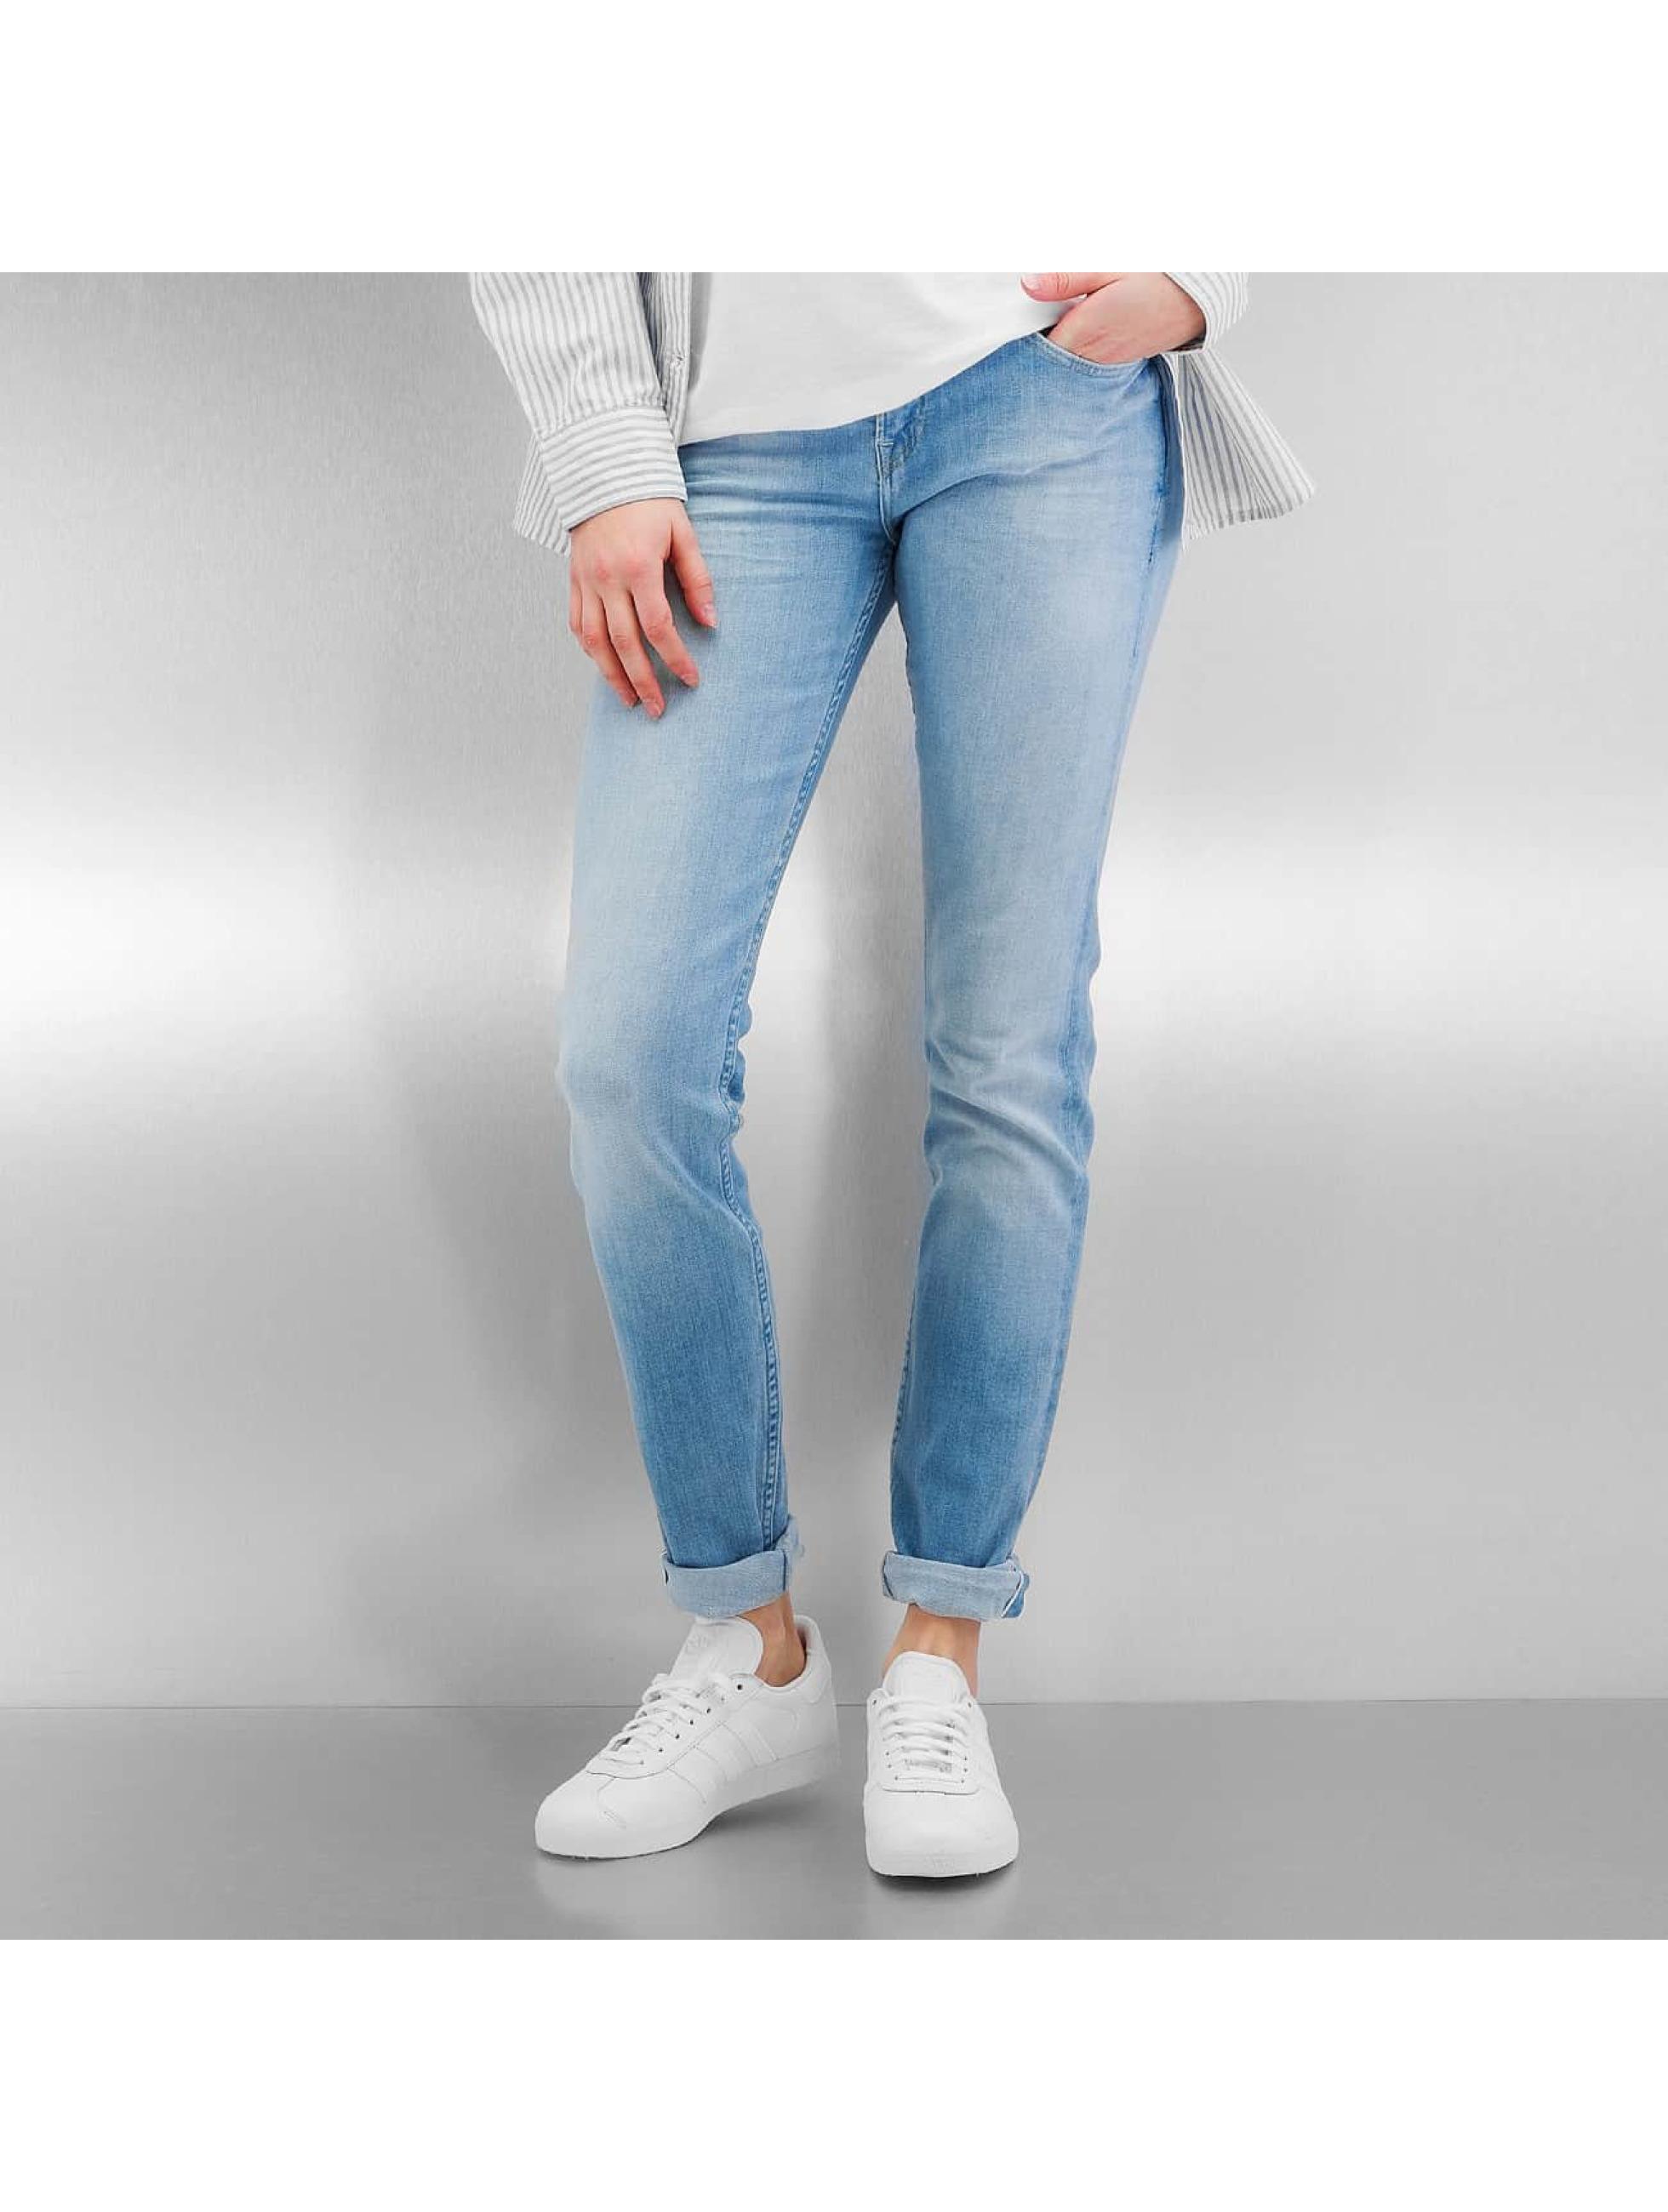 jeans tendance 2017 les 5 jeans phares pour femme defshop france blog. Black Bedroom Furniture Sets. Home Design Ideas